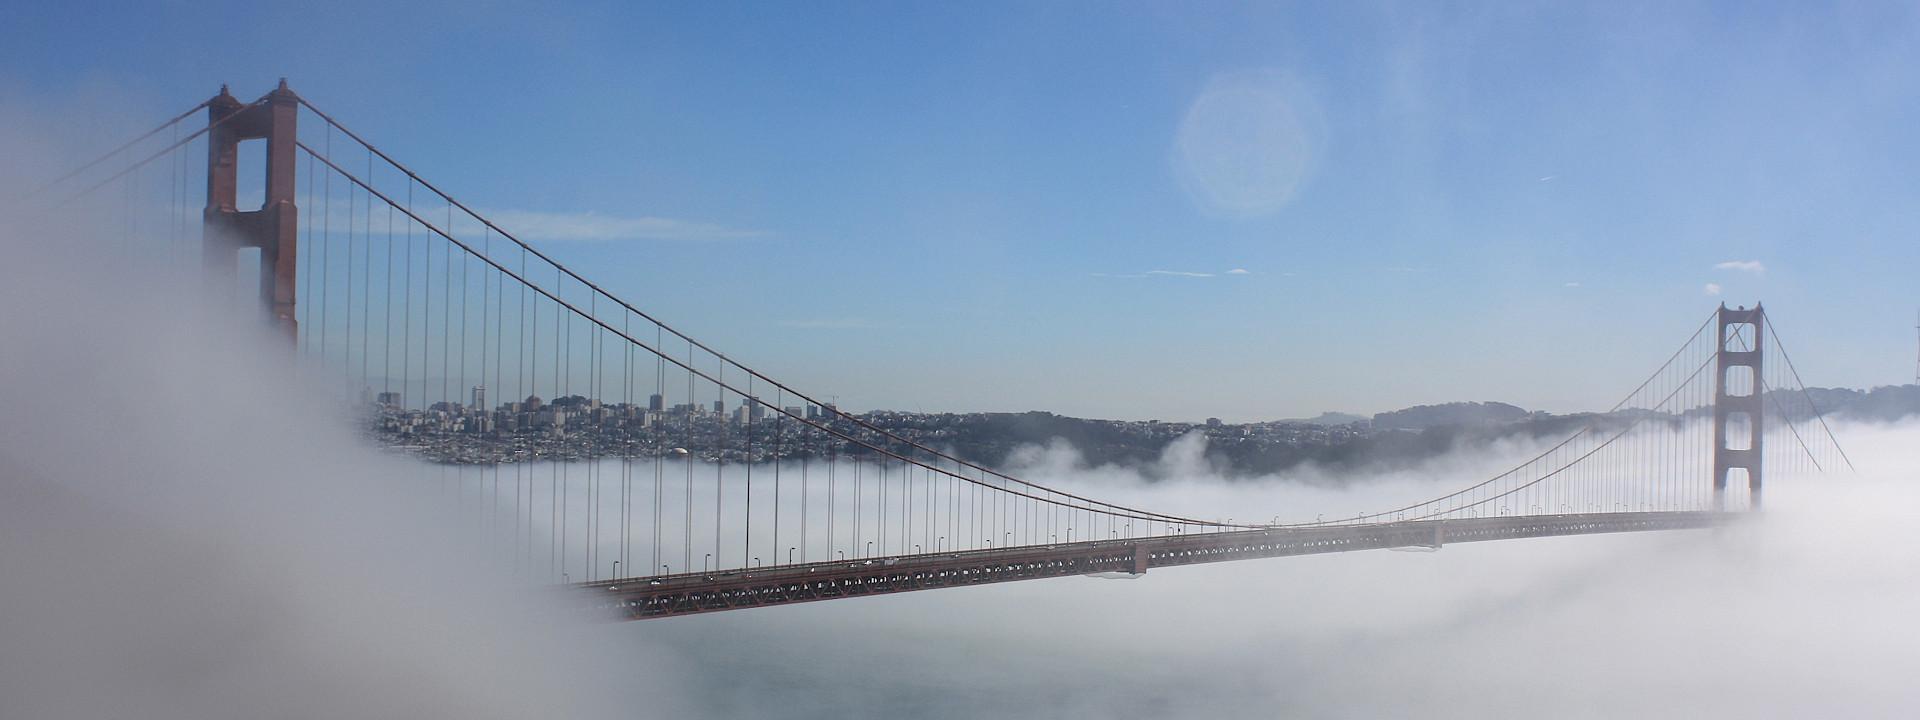 A misty view of the Golden Gate Bridge - photo via Flickr: Mark Gunn